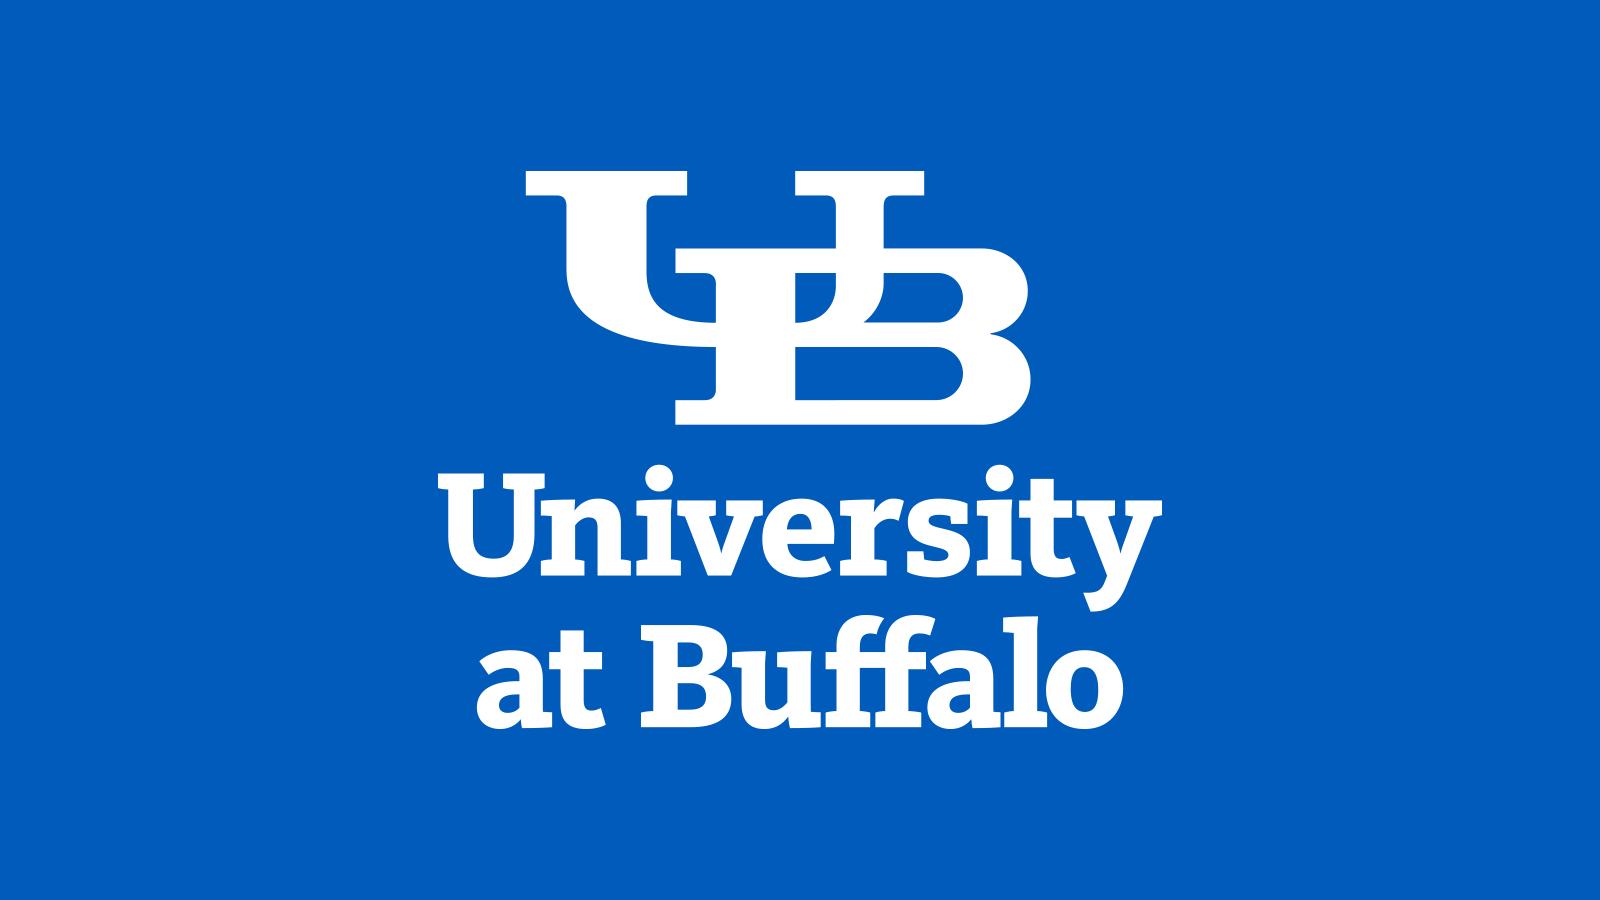 Ub Academic Calendar 2022.Academic Calendar School Of Law University At Buffalo